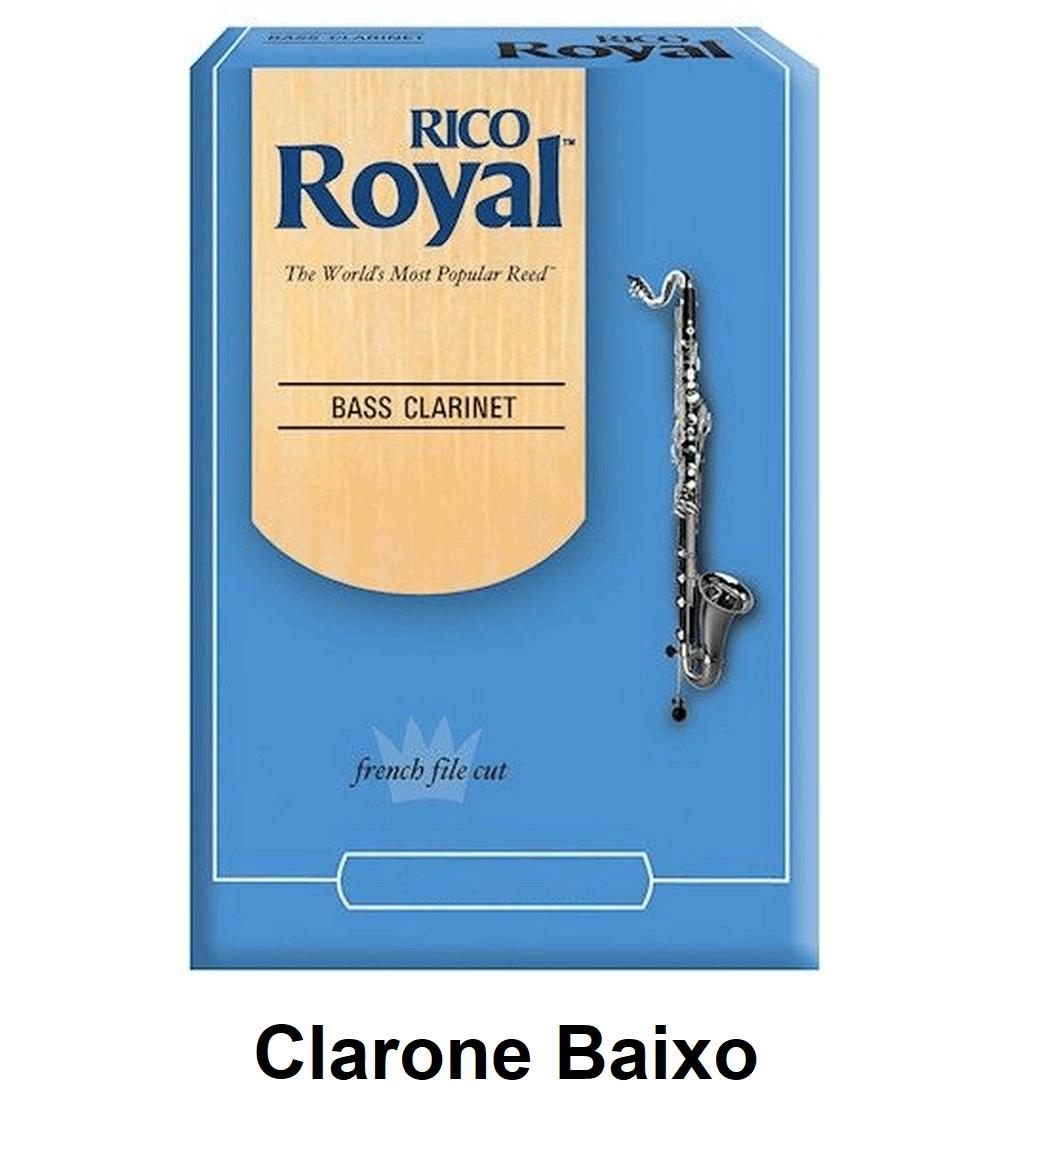 Palheta Rico Royal para Clarone Baixo